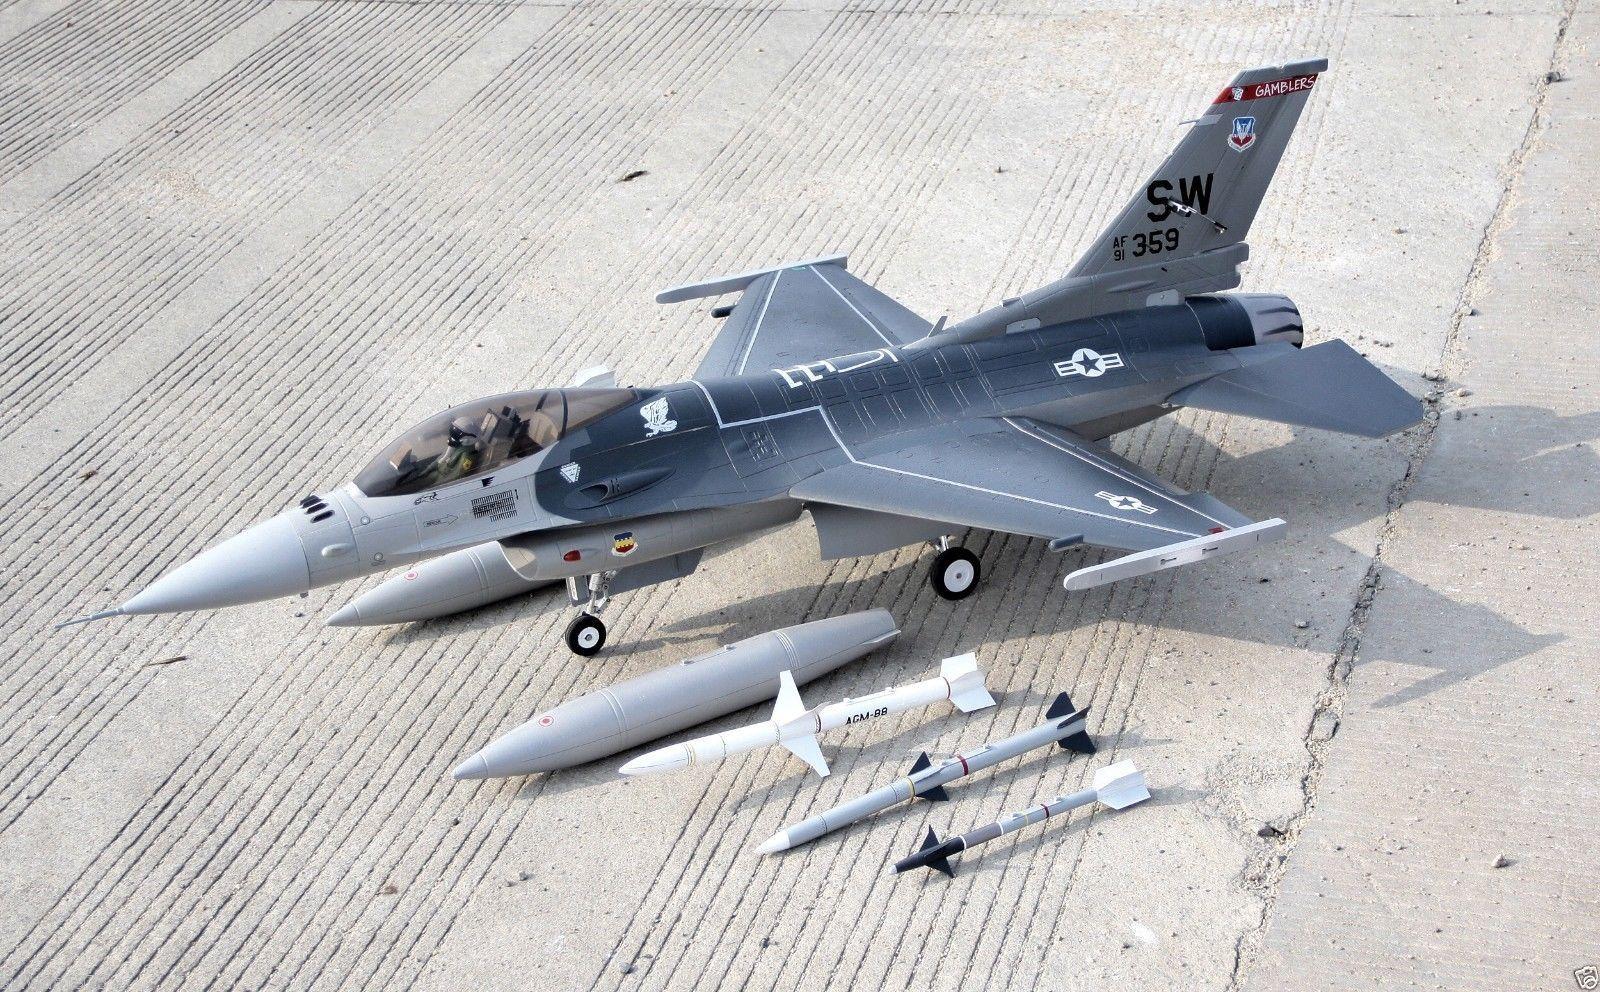 gratuitoWING 1522mm F-16 90mm 12 Blades Metal Housing  EDF Unit PNP Version EPO NIB  ecco l'ultimo